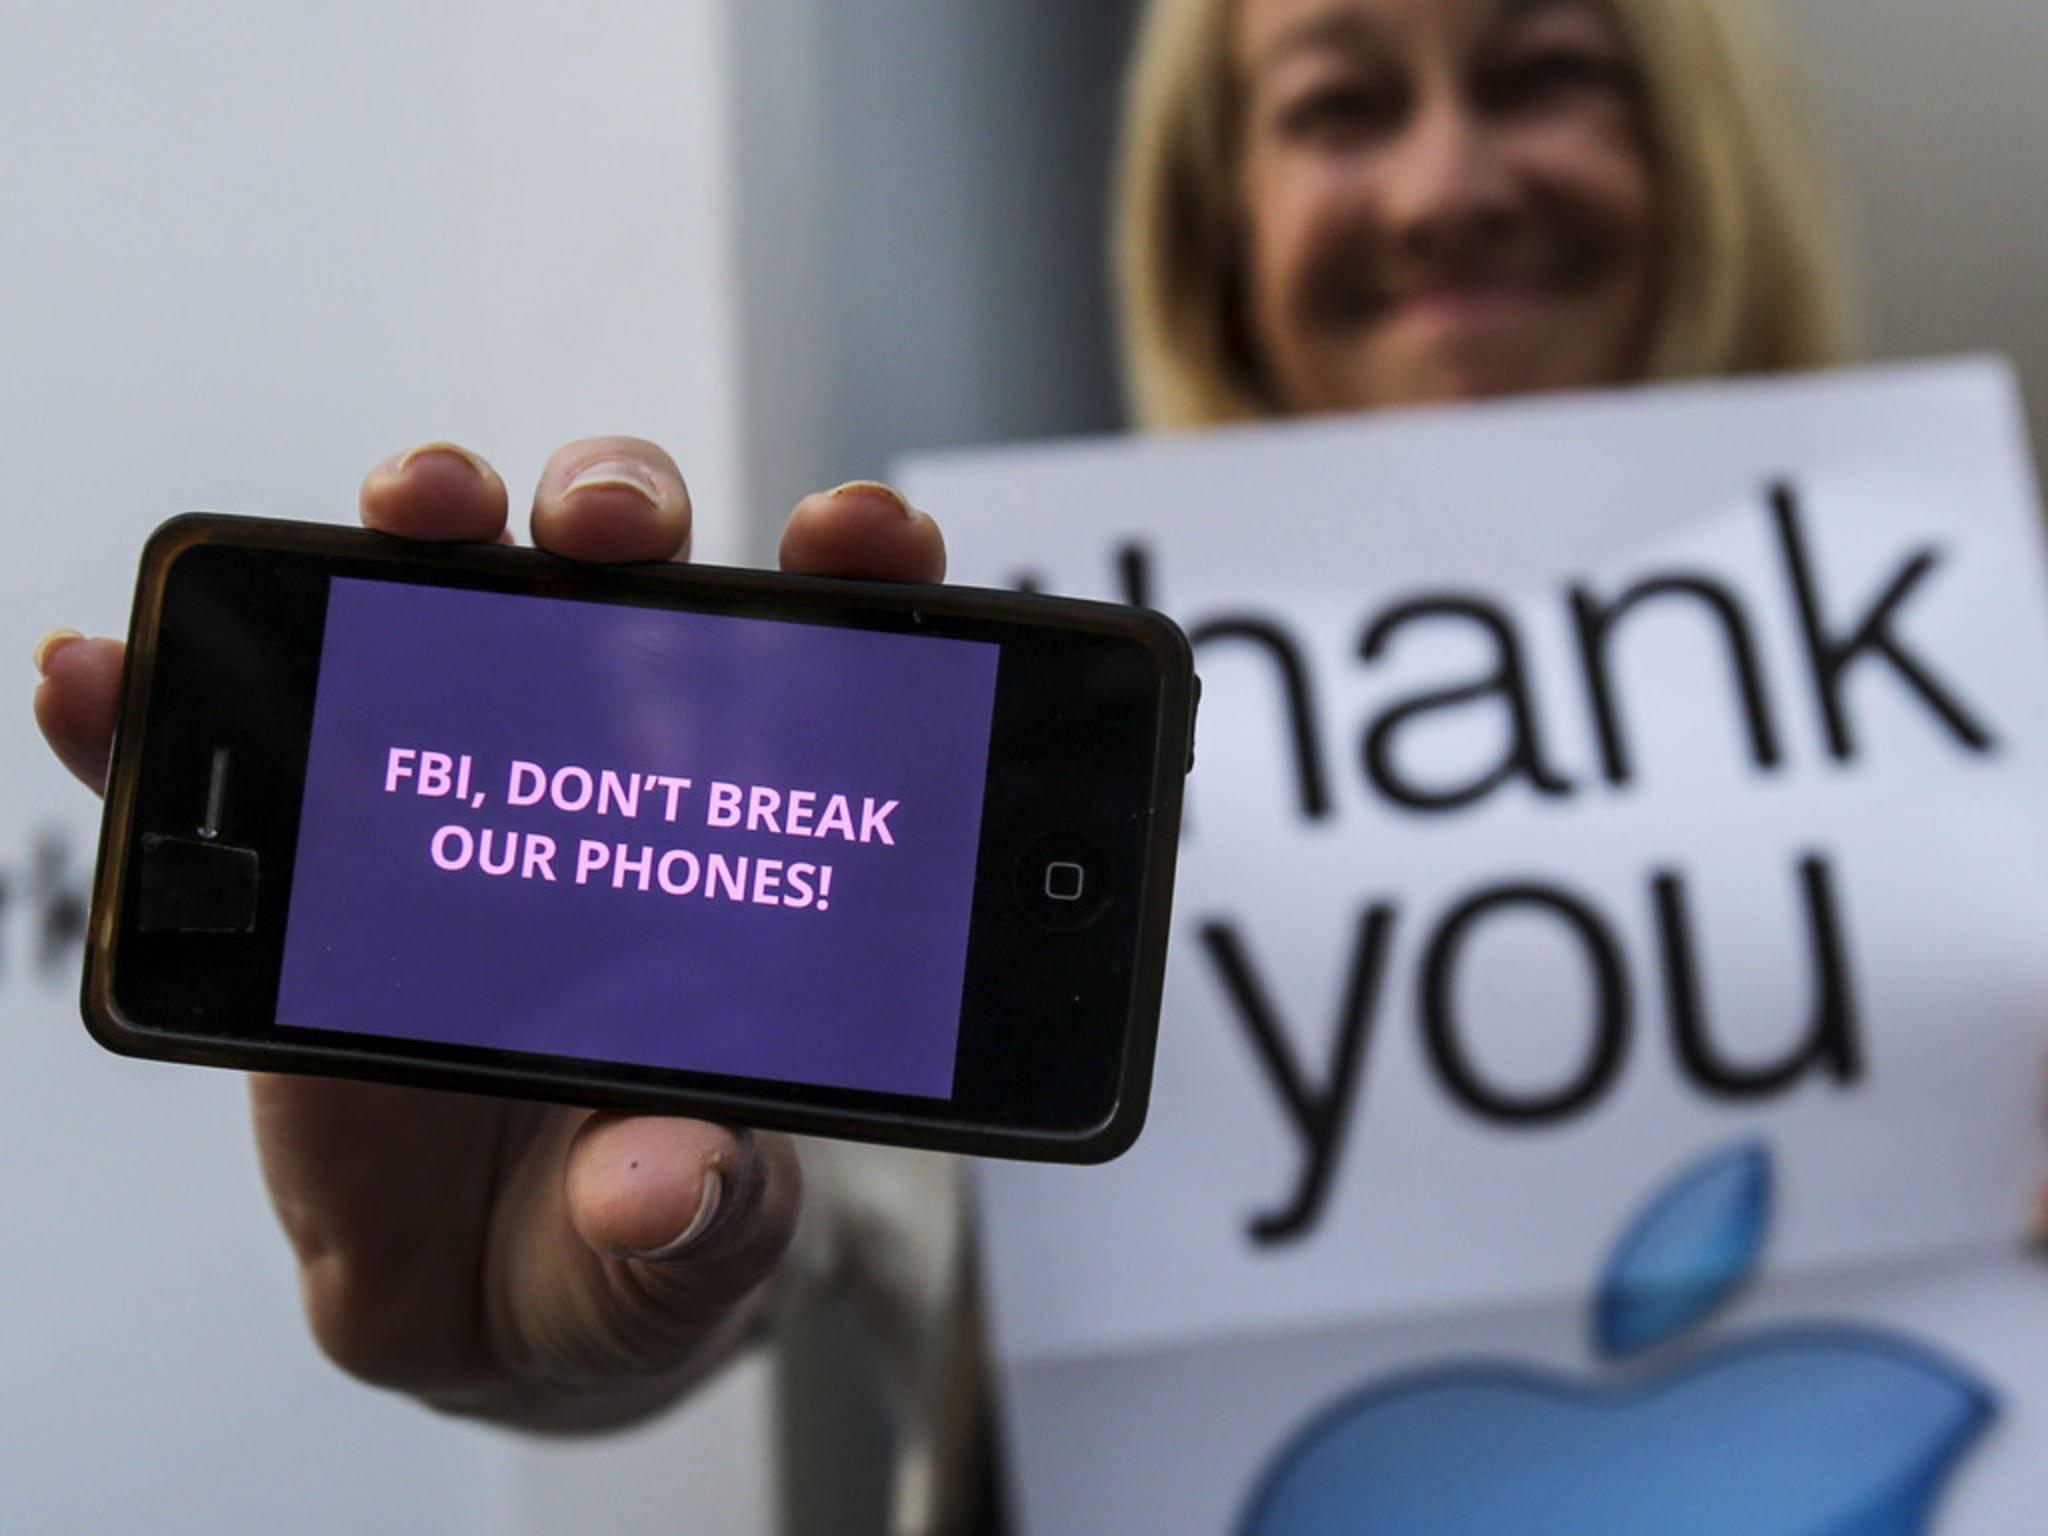 Künftige iPhones sollen sich offenbar noch schwerer hacken lassen.